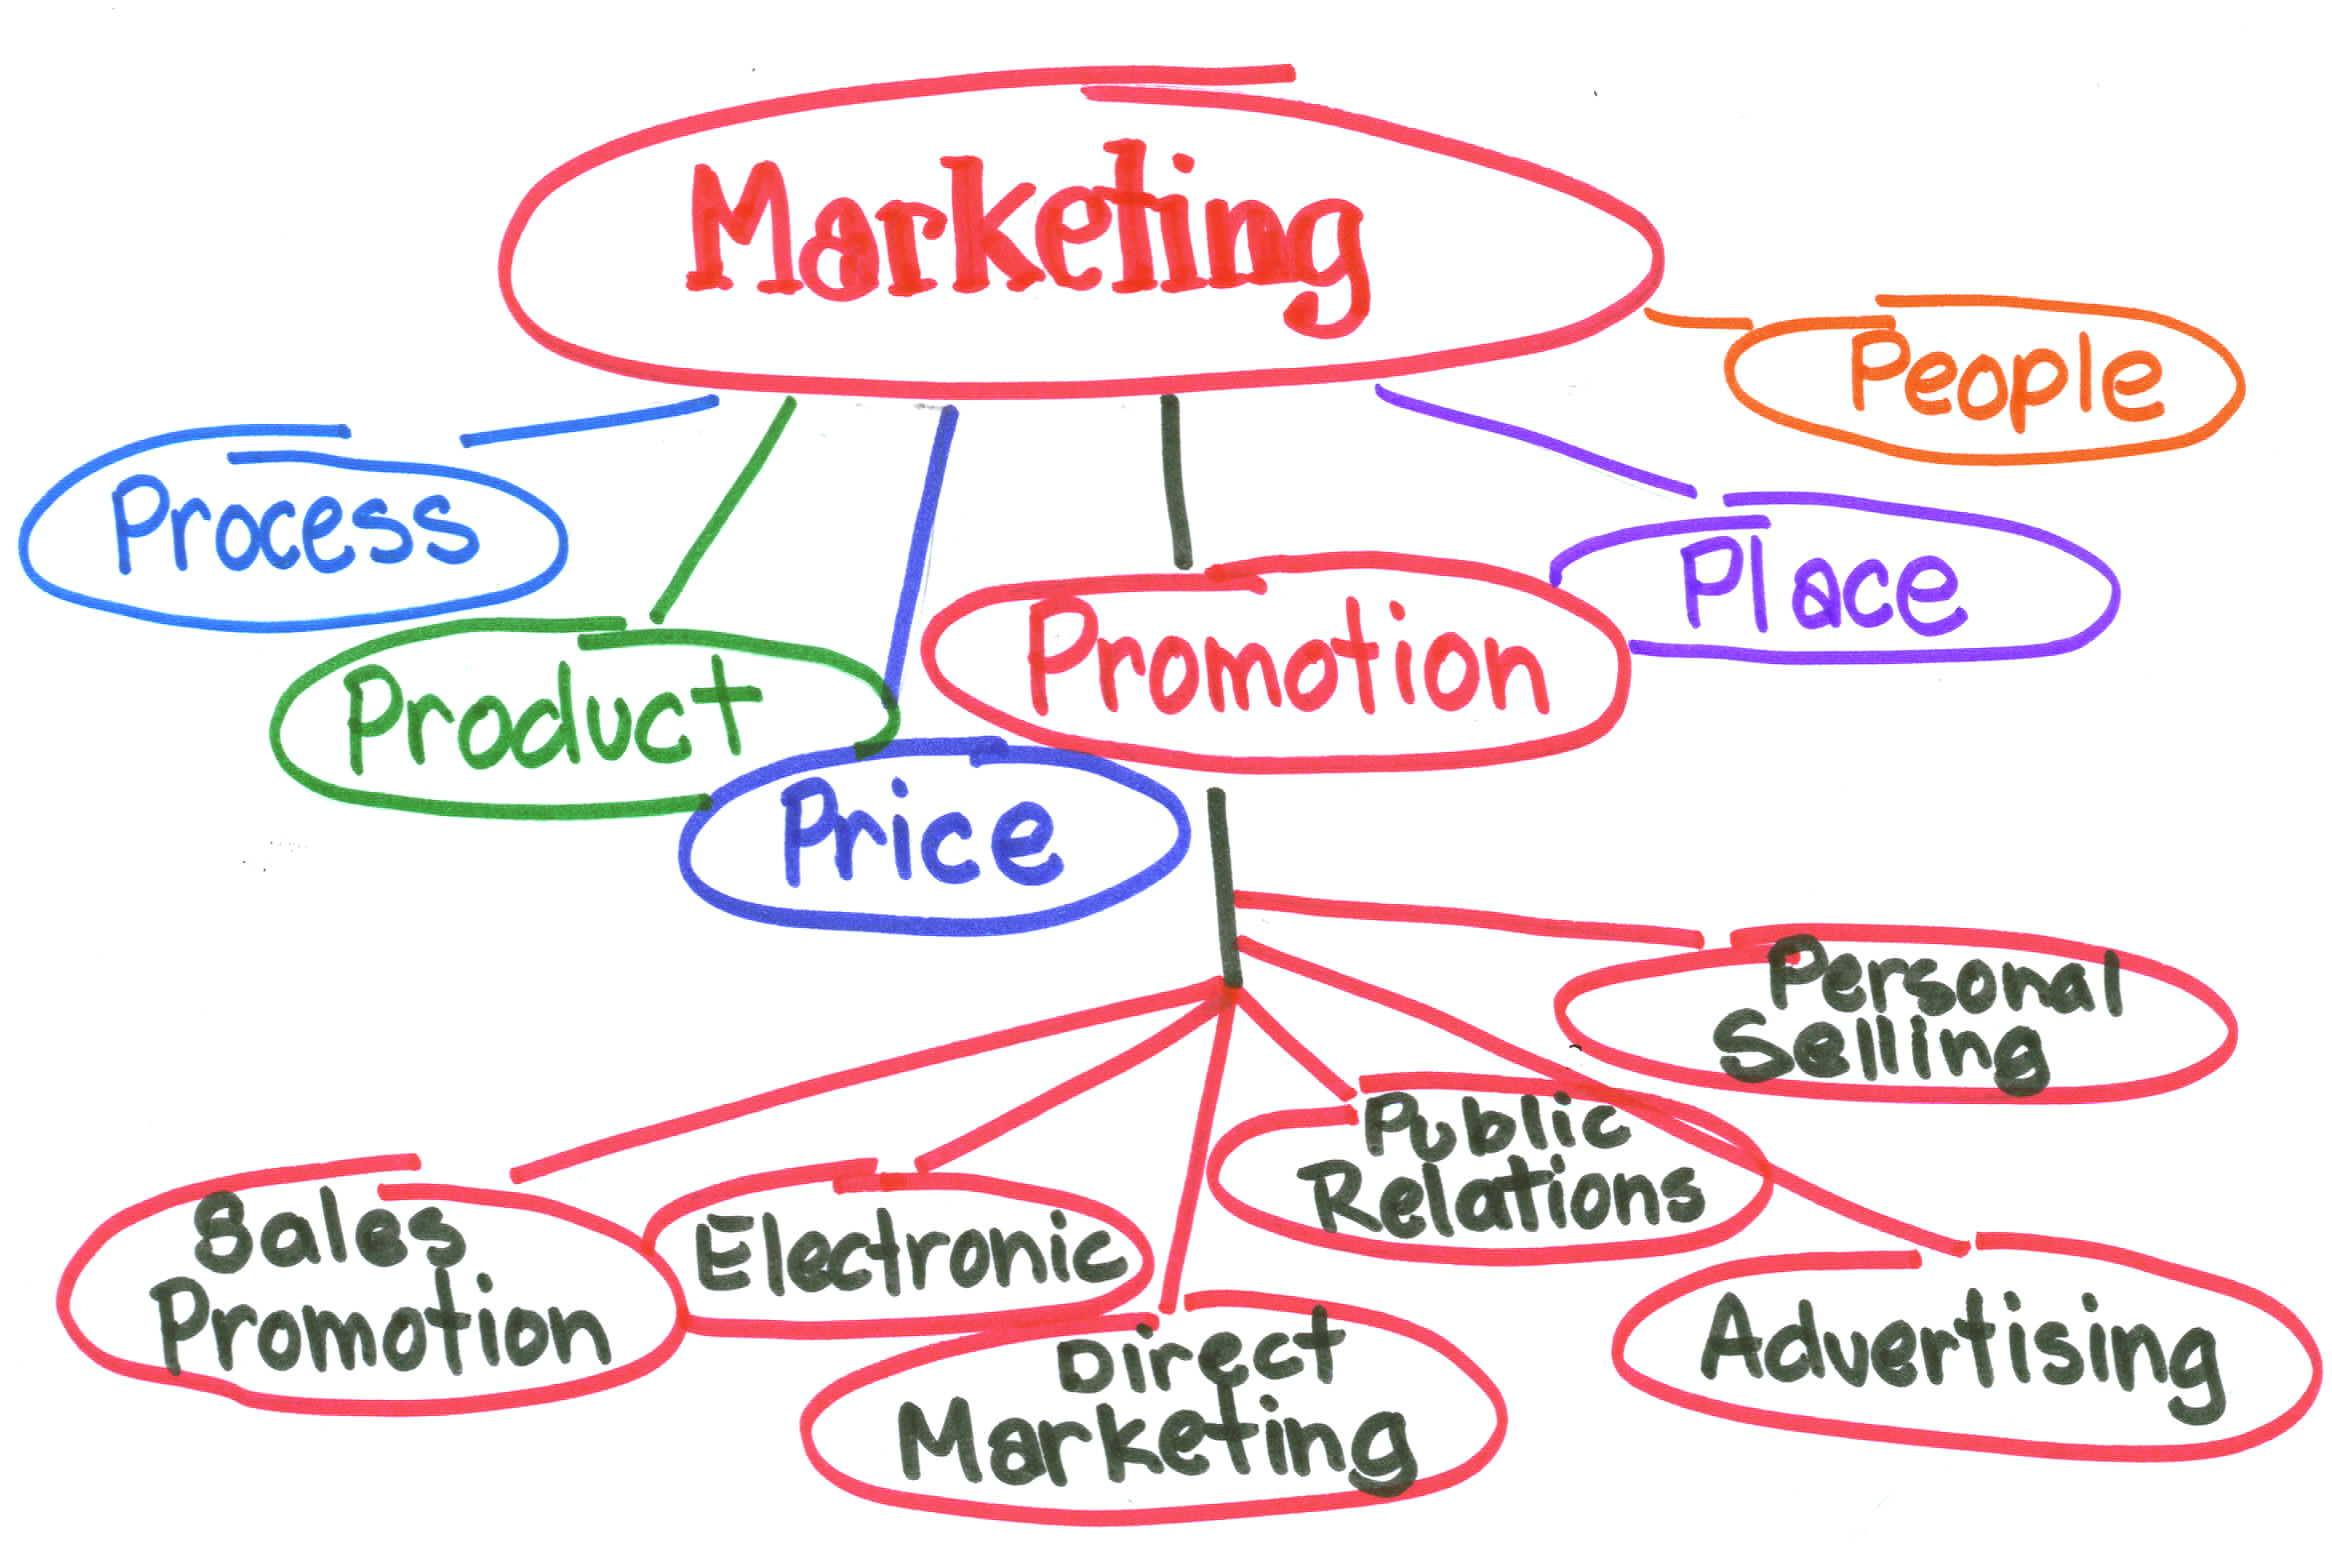 The goal of marketing logistics should be to provide a вставка кода google e-commerce в google analytics